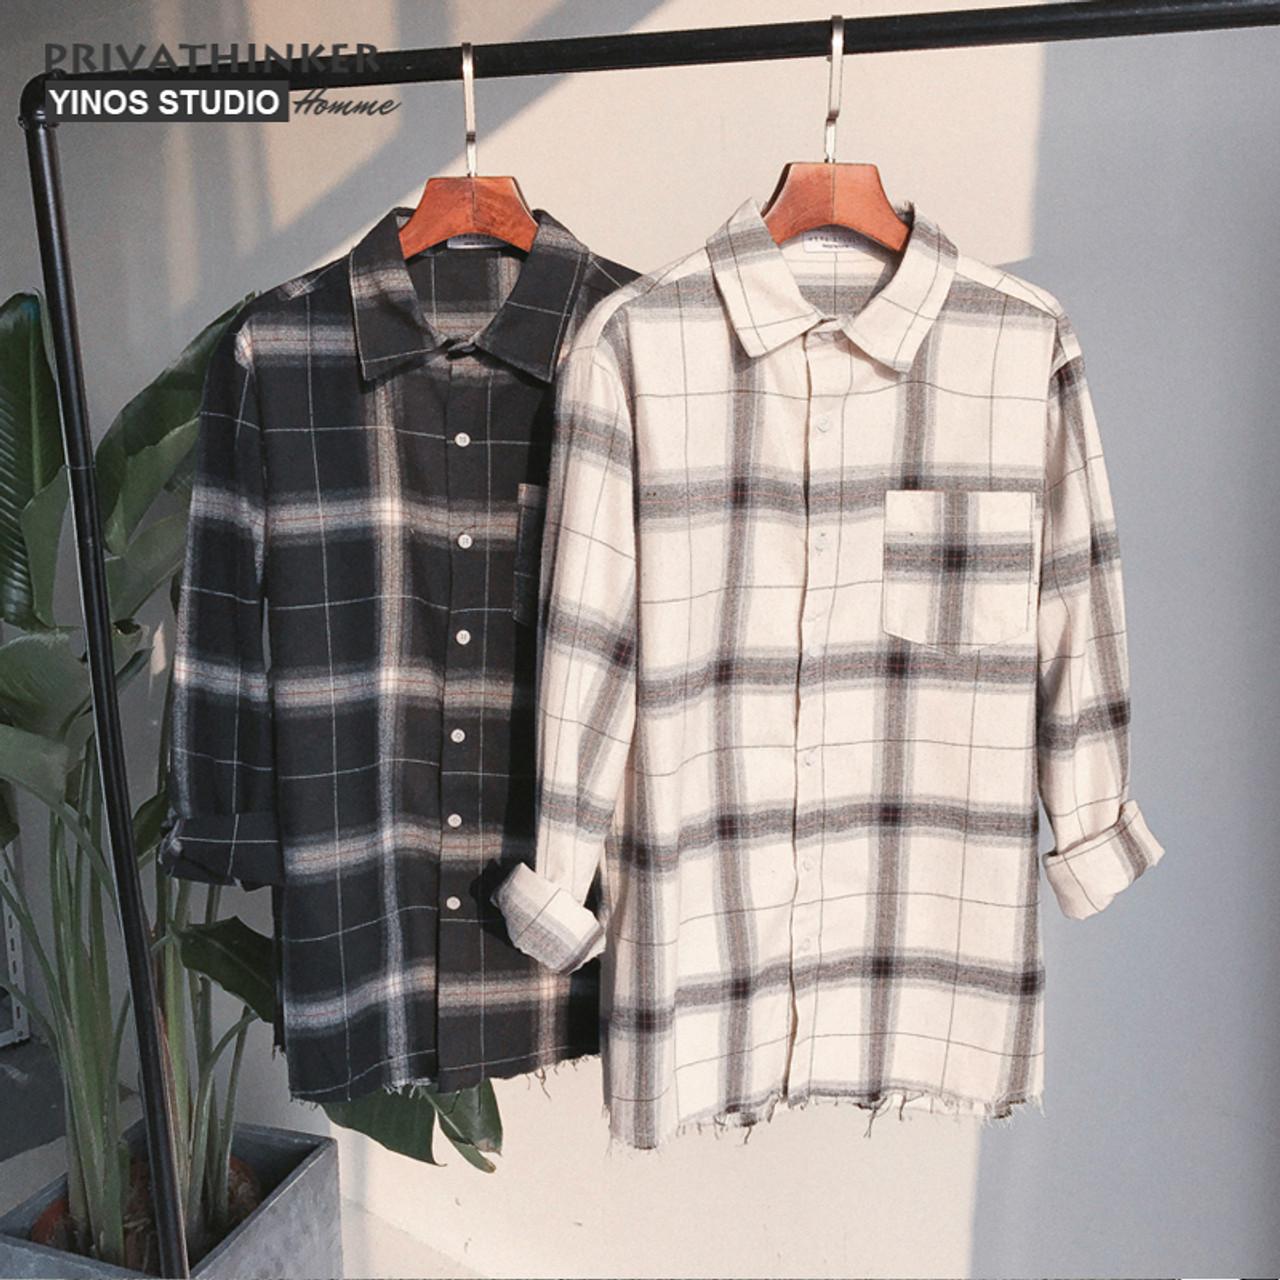 7f9bacc4 ... Privathinker Spring Oversized Long Sleeve Shirt Men Women Casual Plaid  Flannel Burr Shirts Harajuku Male Strip ...